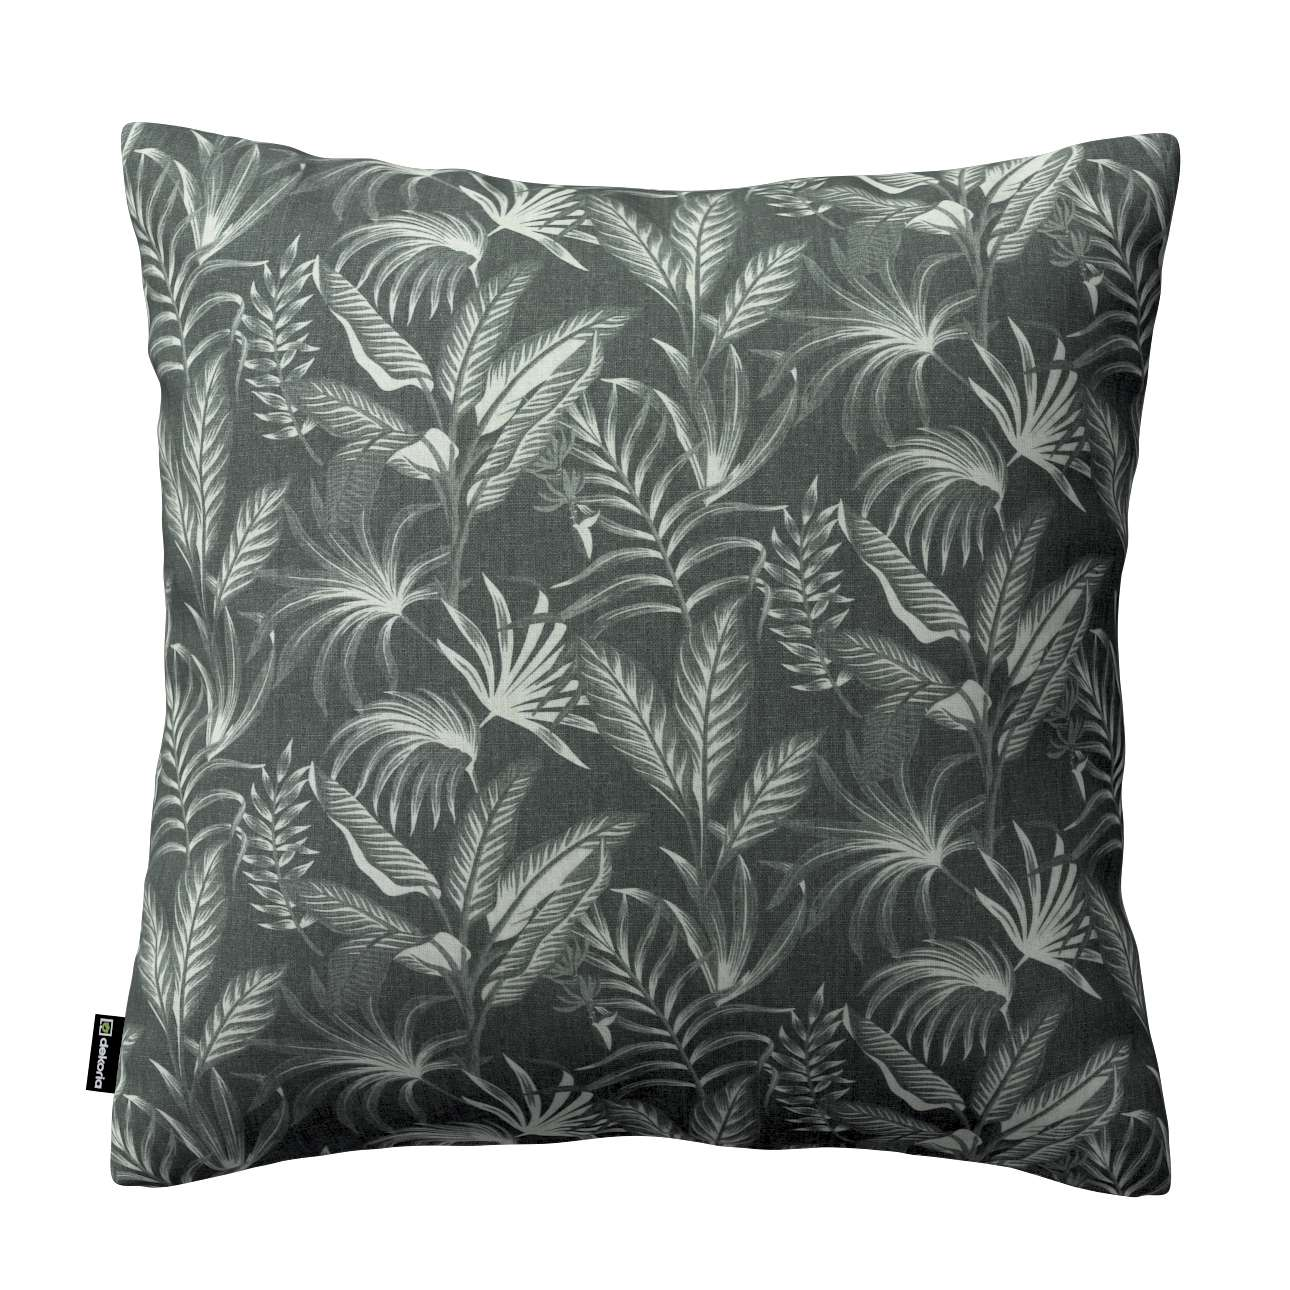 Dekoria Kinga - potah na polštář jednoduchý, listy na černém pozadí, 60 × 60 cm, Flowers, 143-73